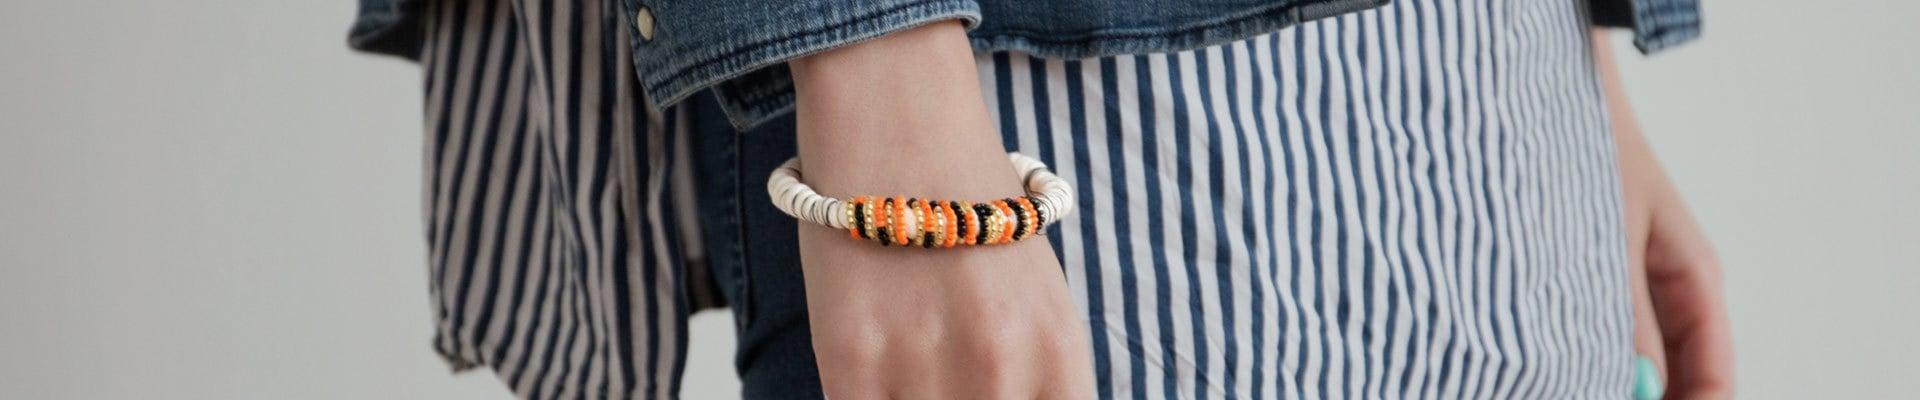 Armband selber machen DIY Ideen